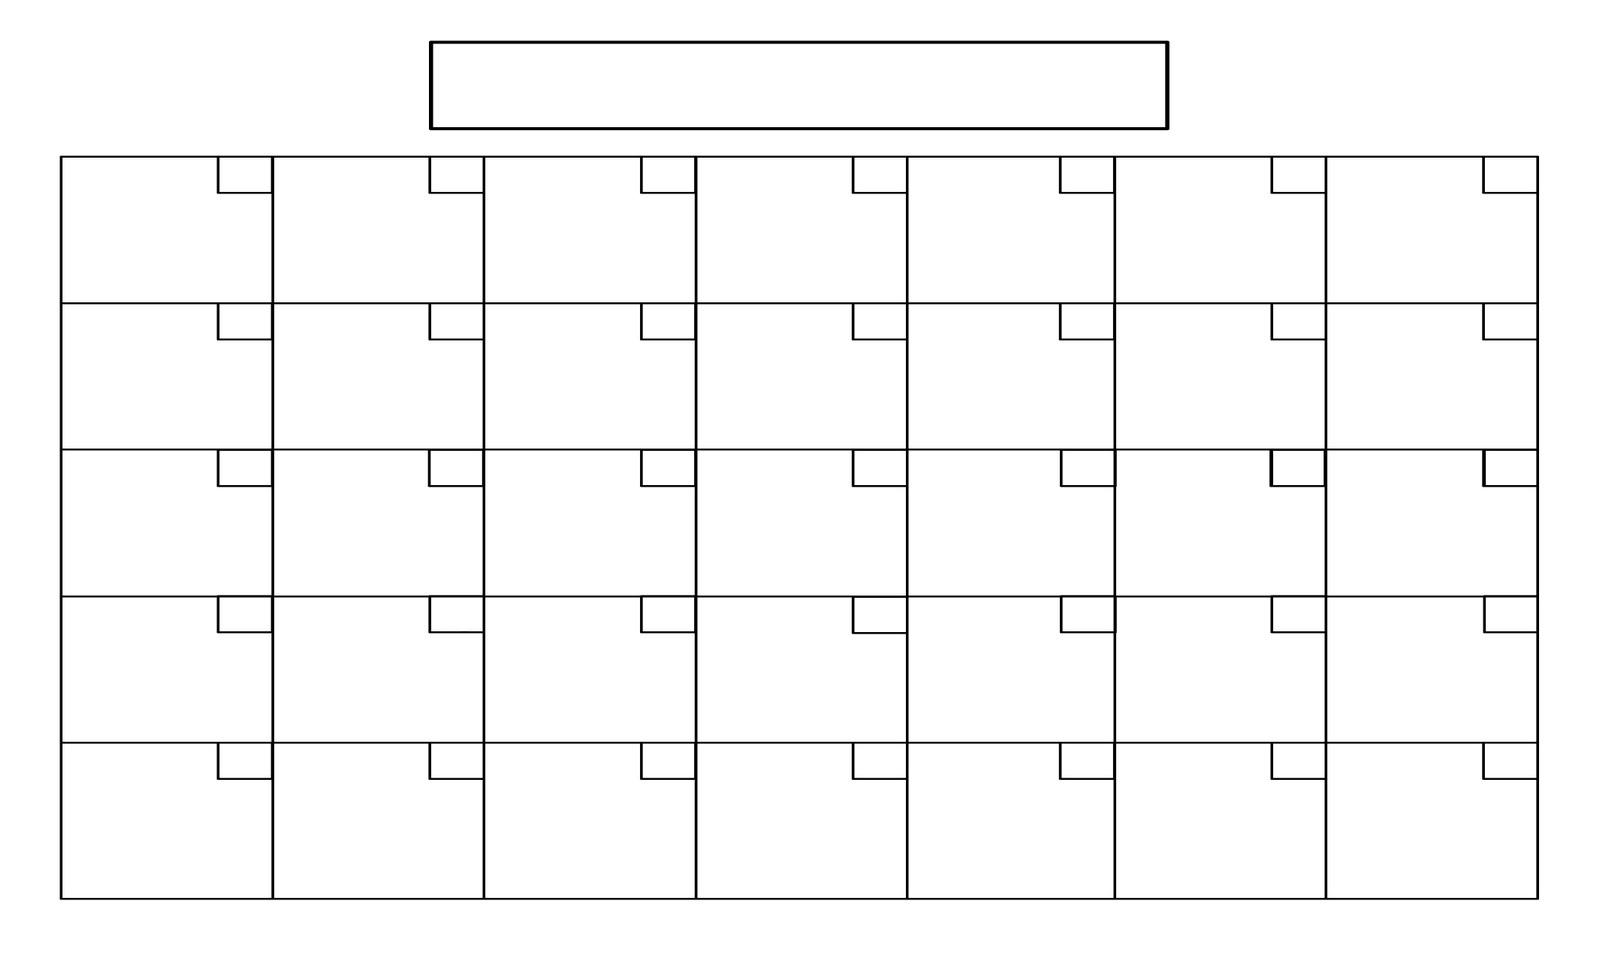 Full Size Blank Printable Calendar - Calendar Inspiration Design regarding Full Size Blank Printable Calendar